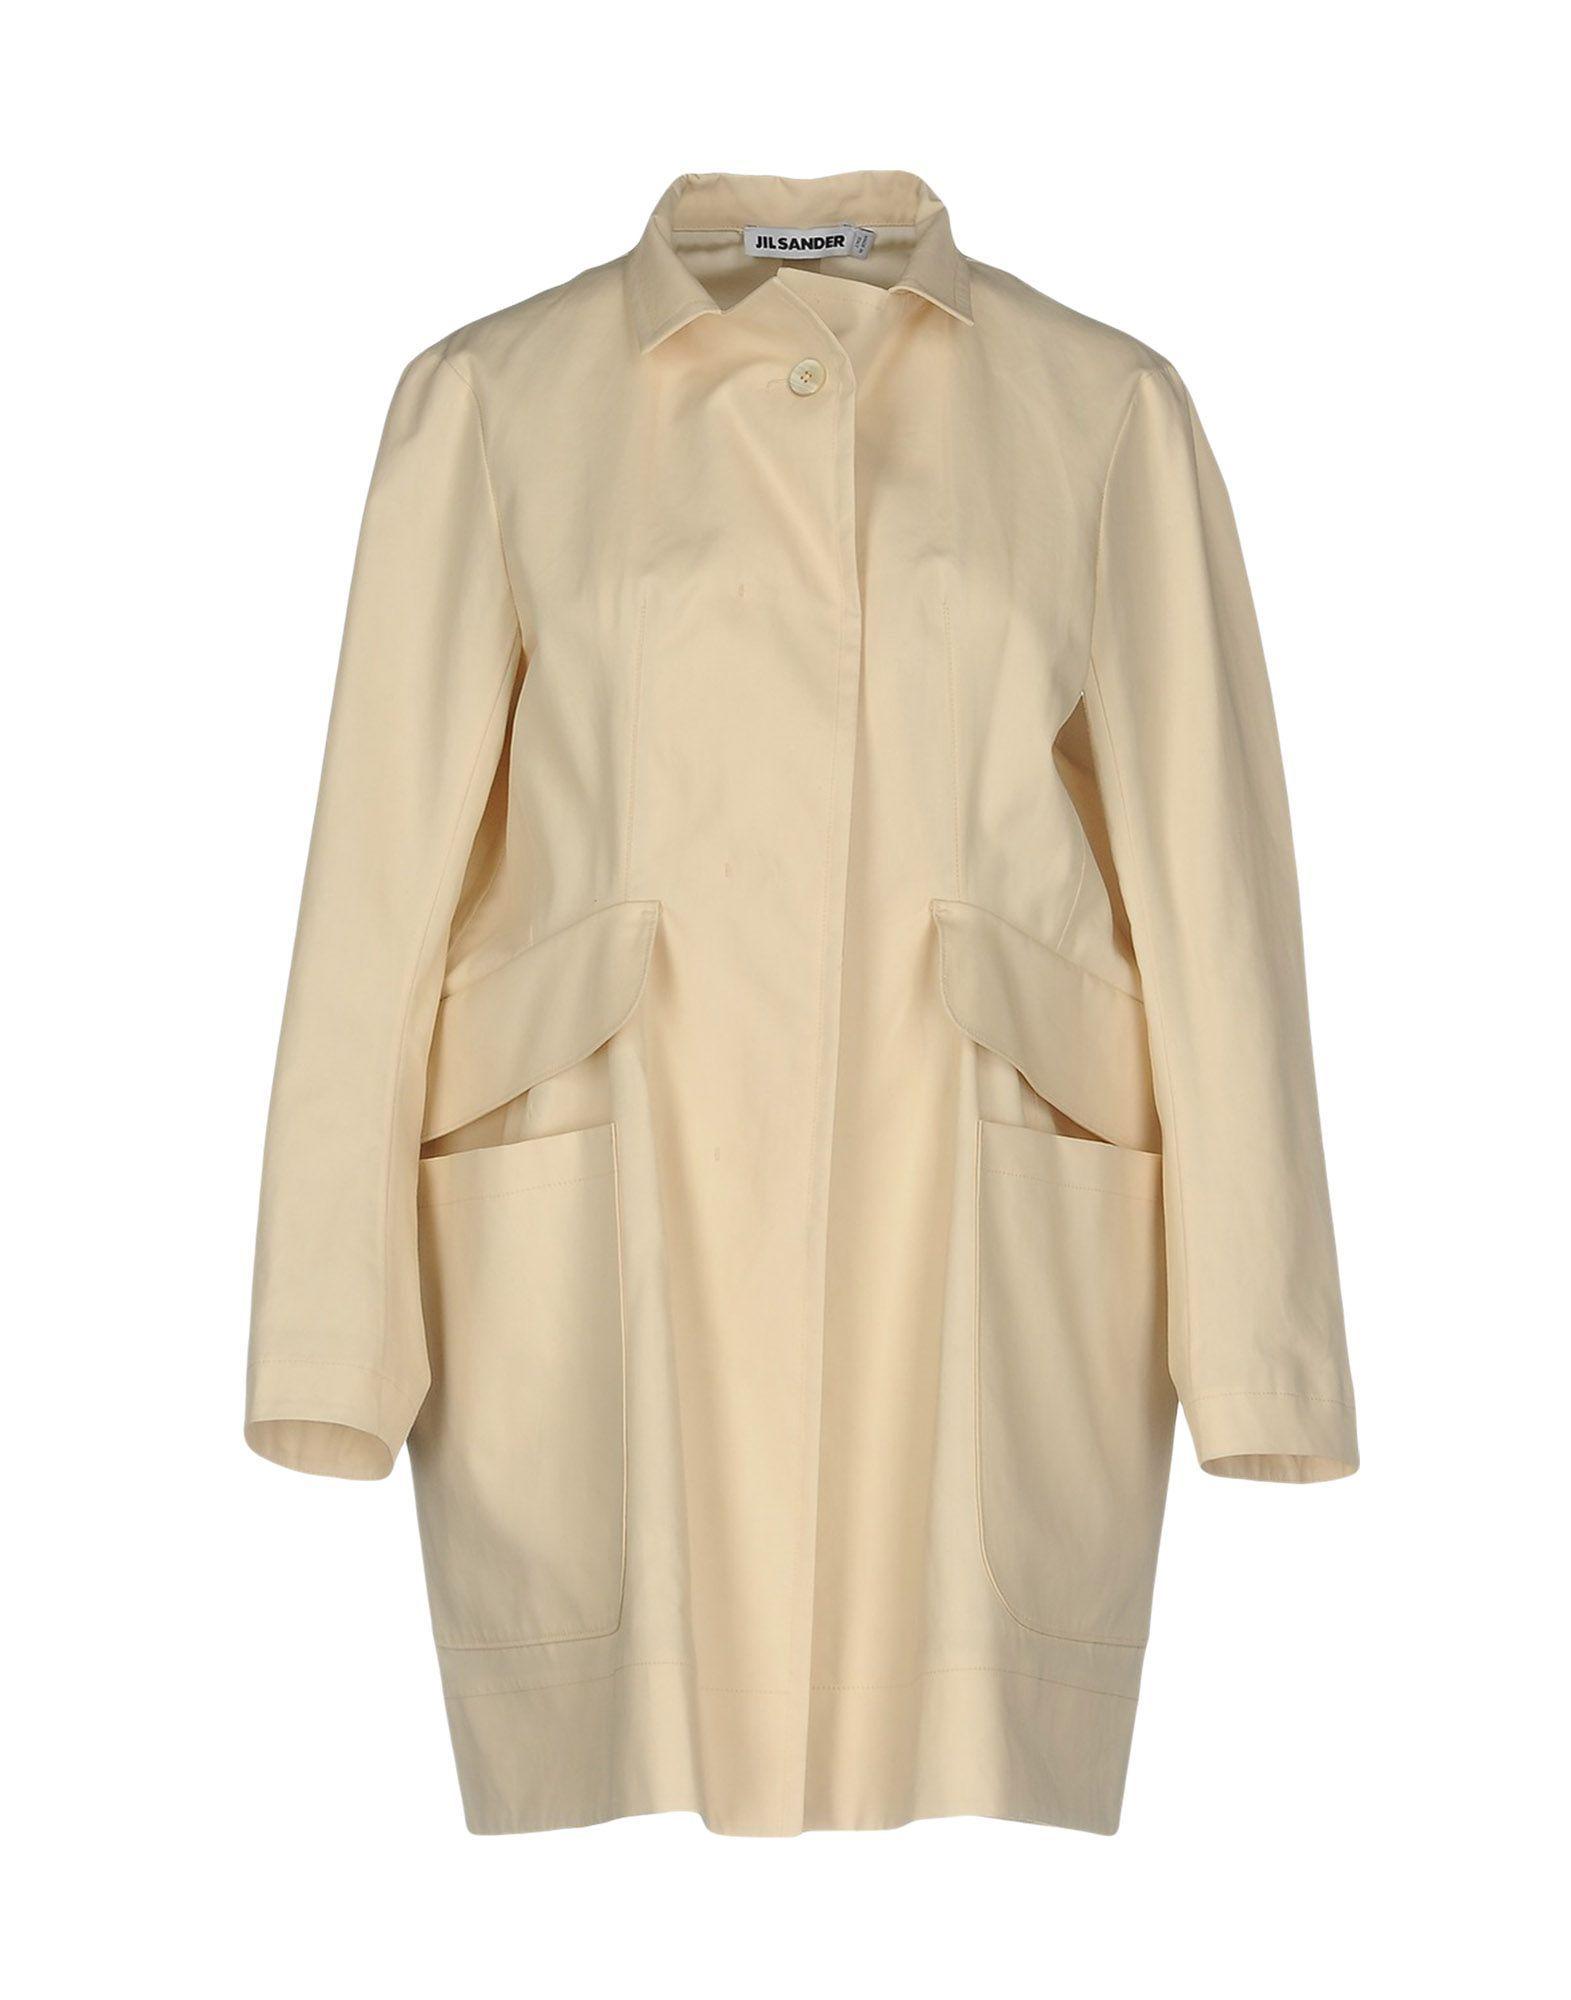 Jil Sander Ivory Cotton Coat